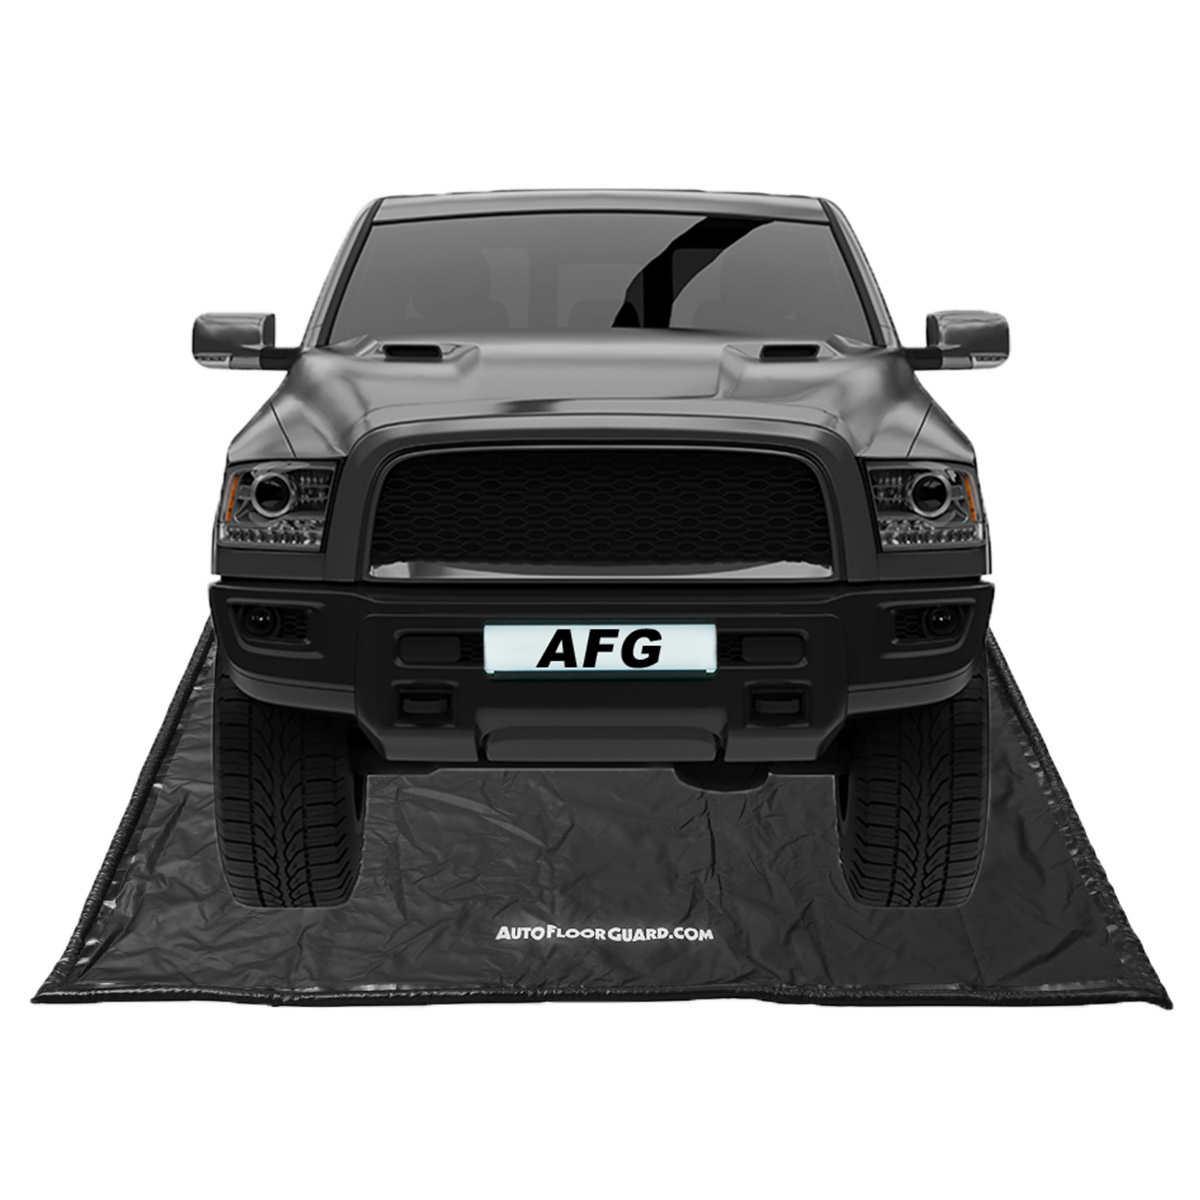 Weathertech mats costco - Auto Floor Guard 8 5 X20 Suv Truck Vehicle Containment Mat